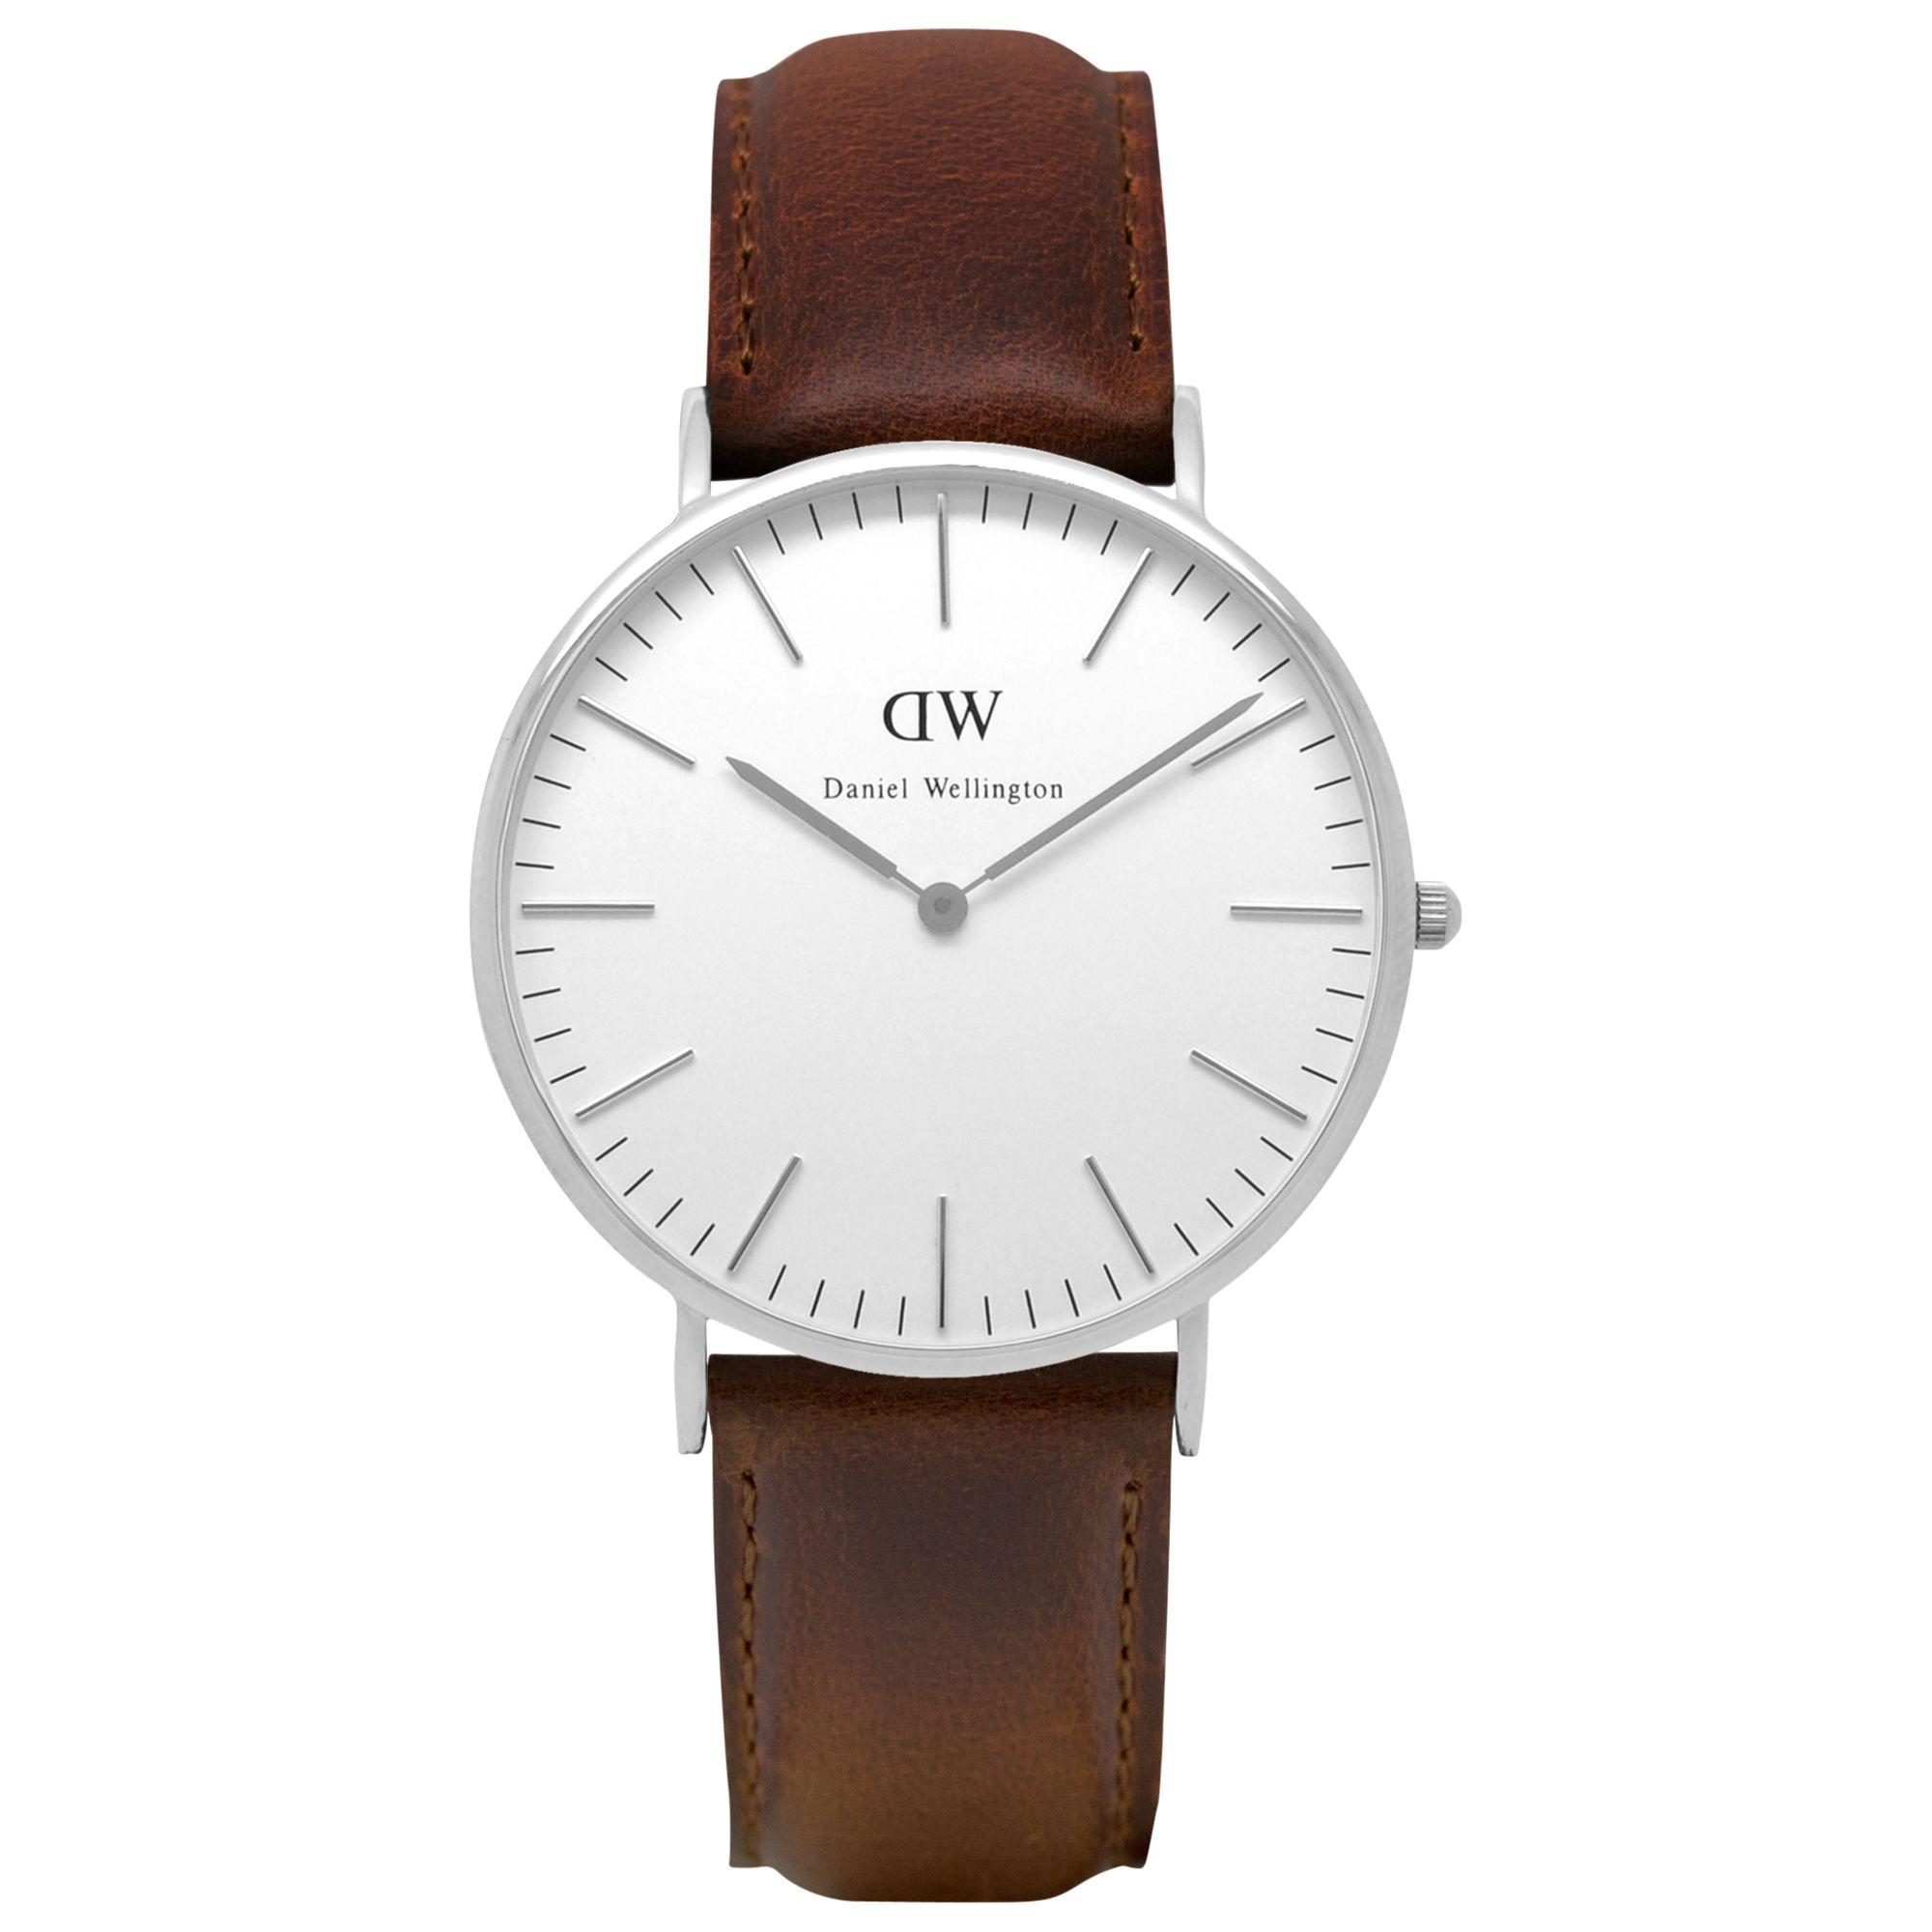 Daniel Wellington Daniel Wellington 0209DW Men's Classic Bristol Stainless Steel Leather Strap Watch, Tan/White